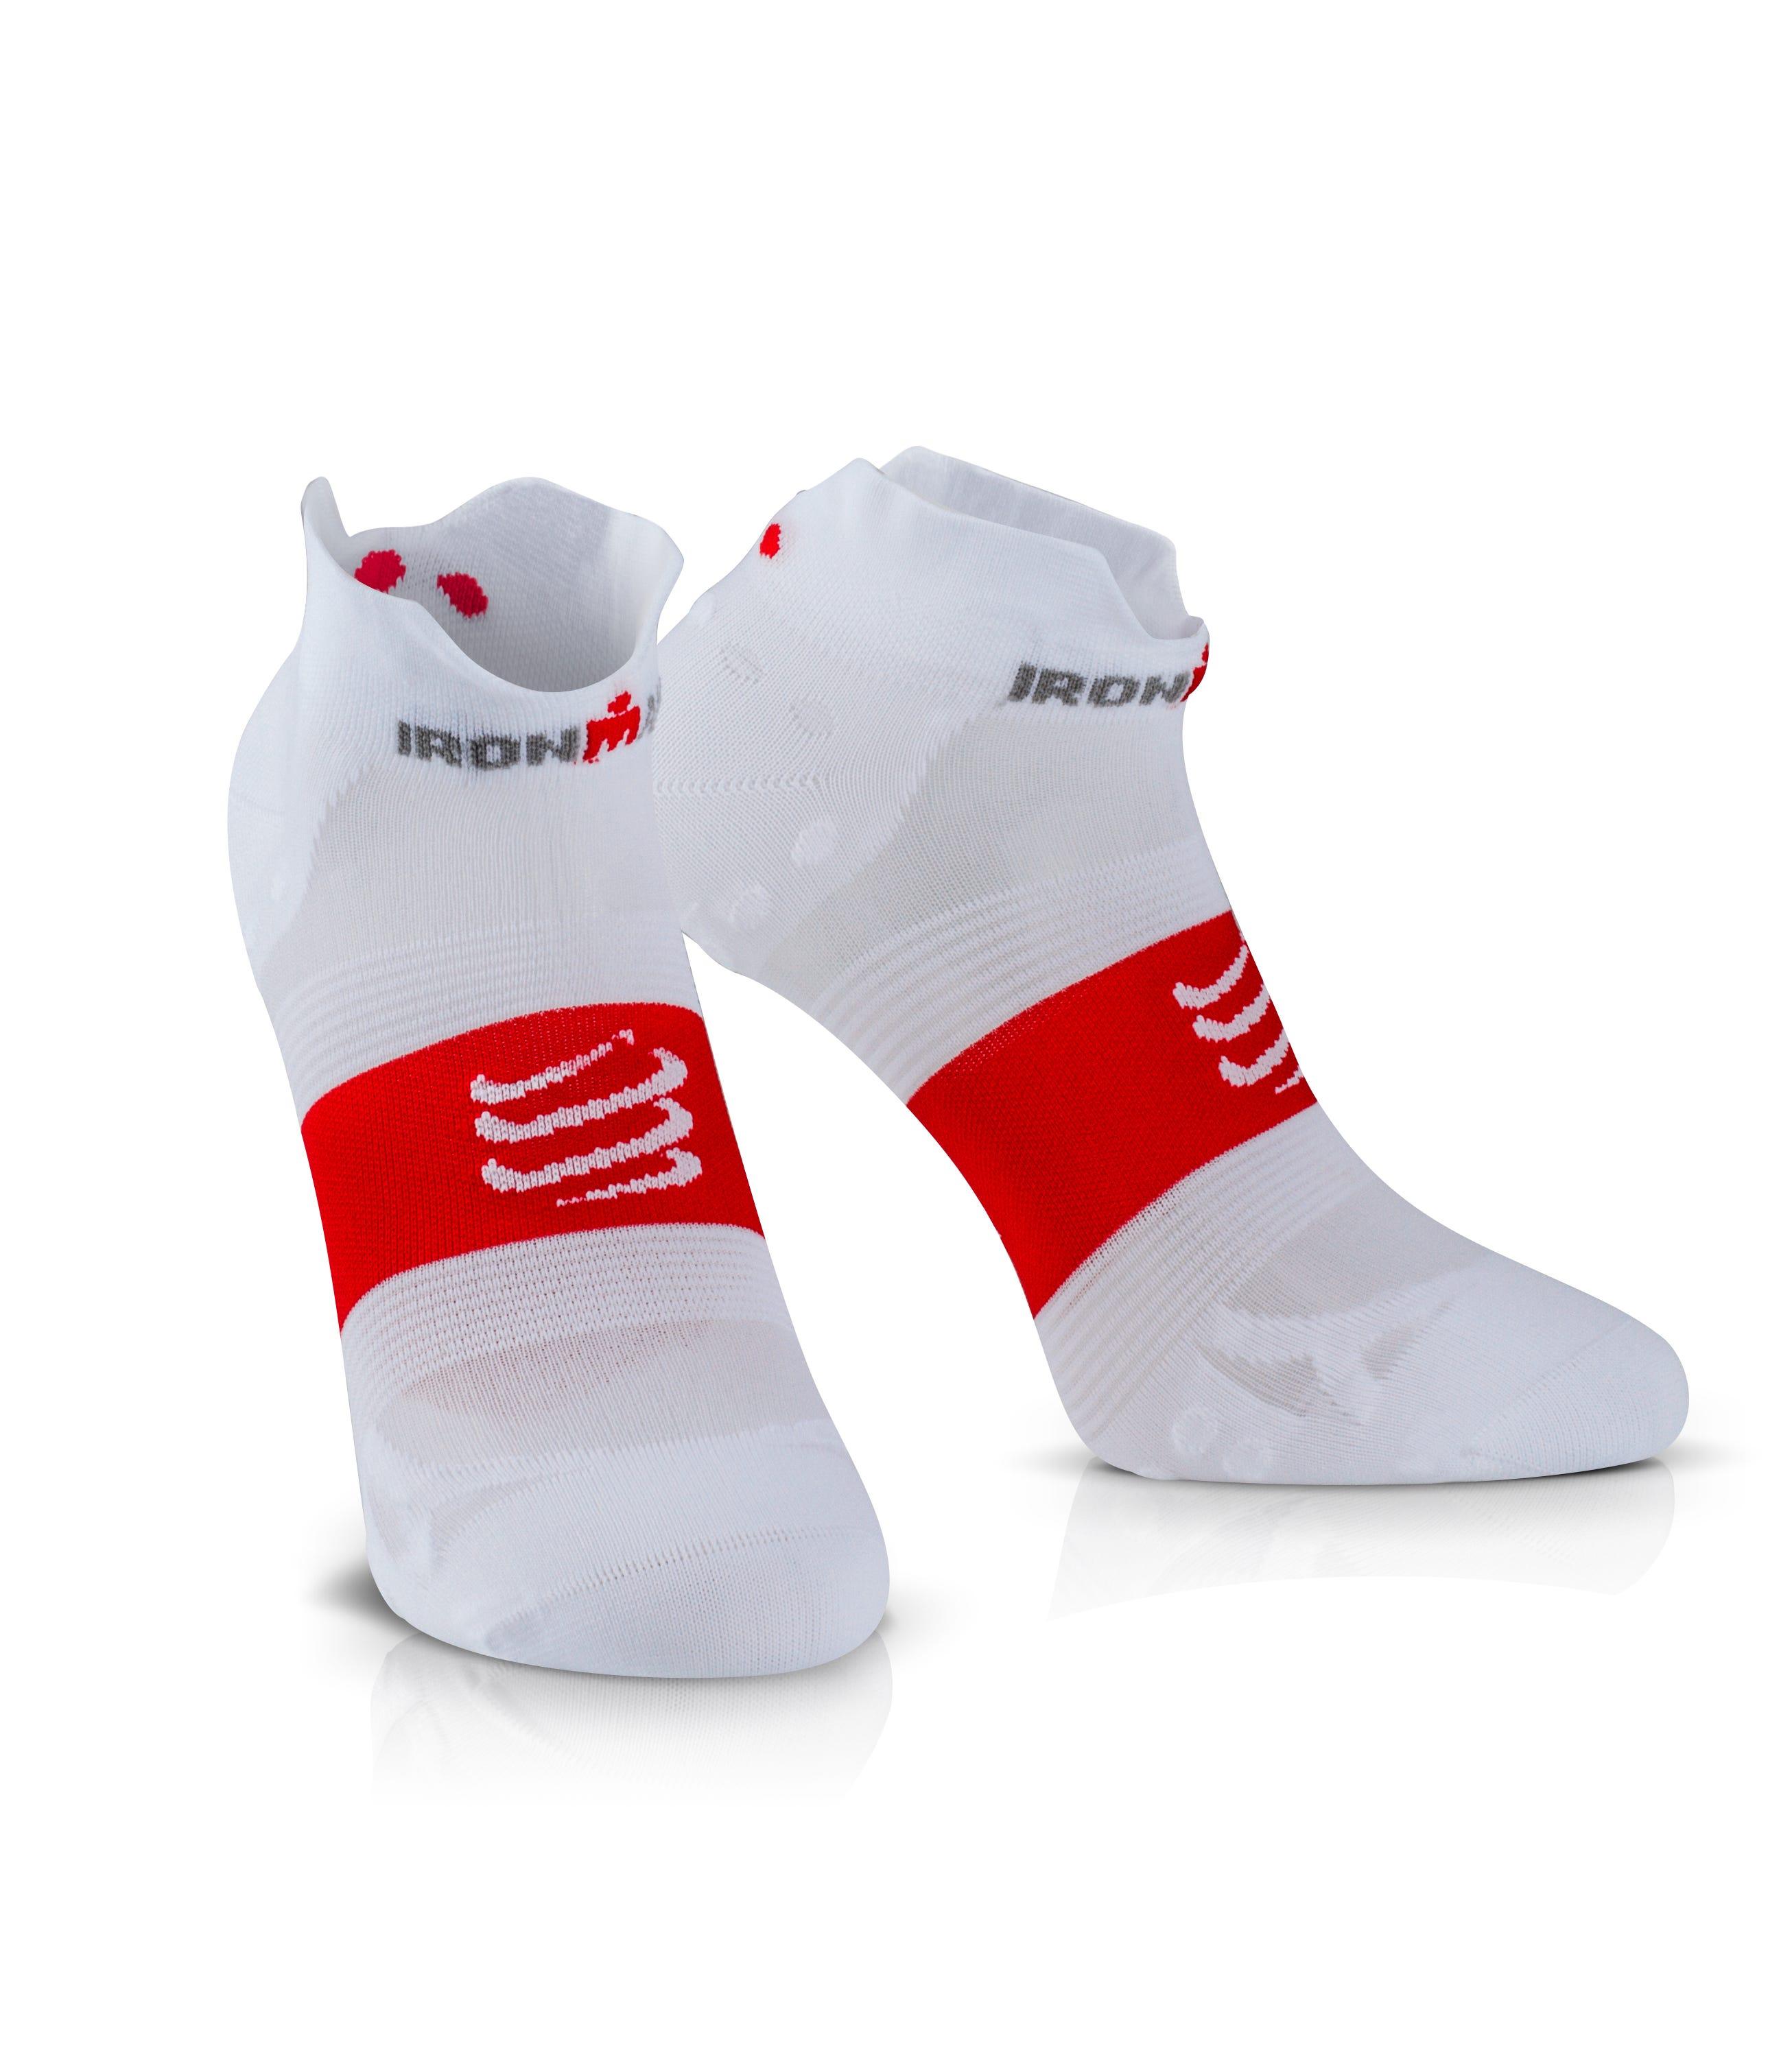 IRONMAN COMPRESSPORT Pro Racing Socks V3 Ultralight Low - White 49c36c1d022